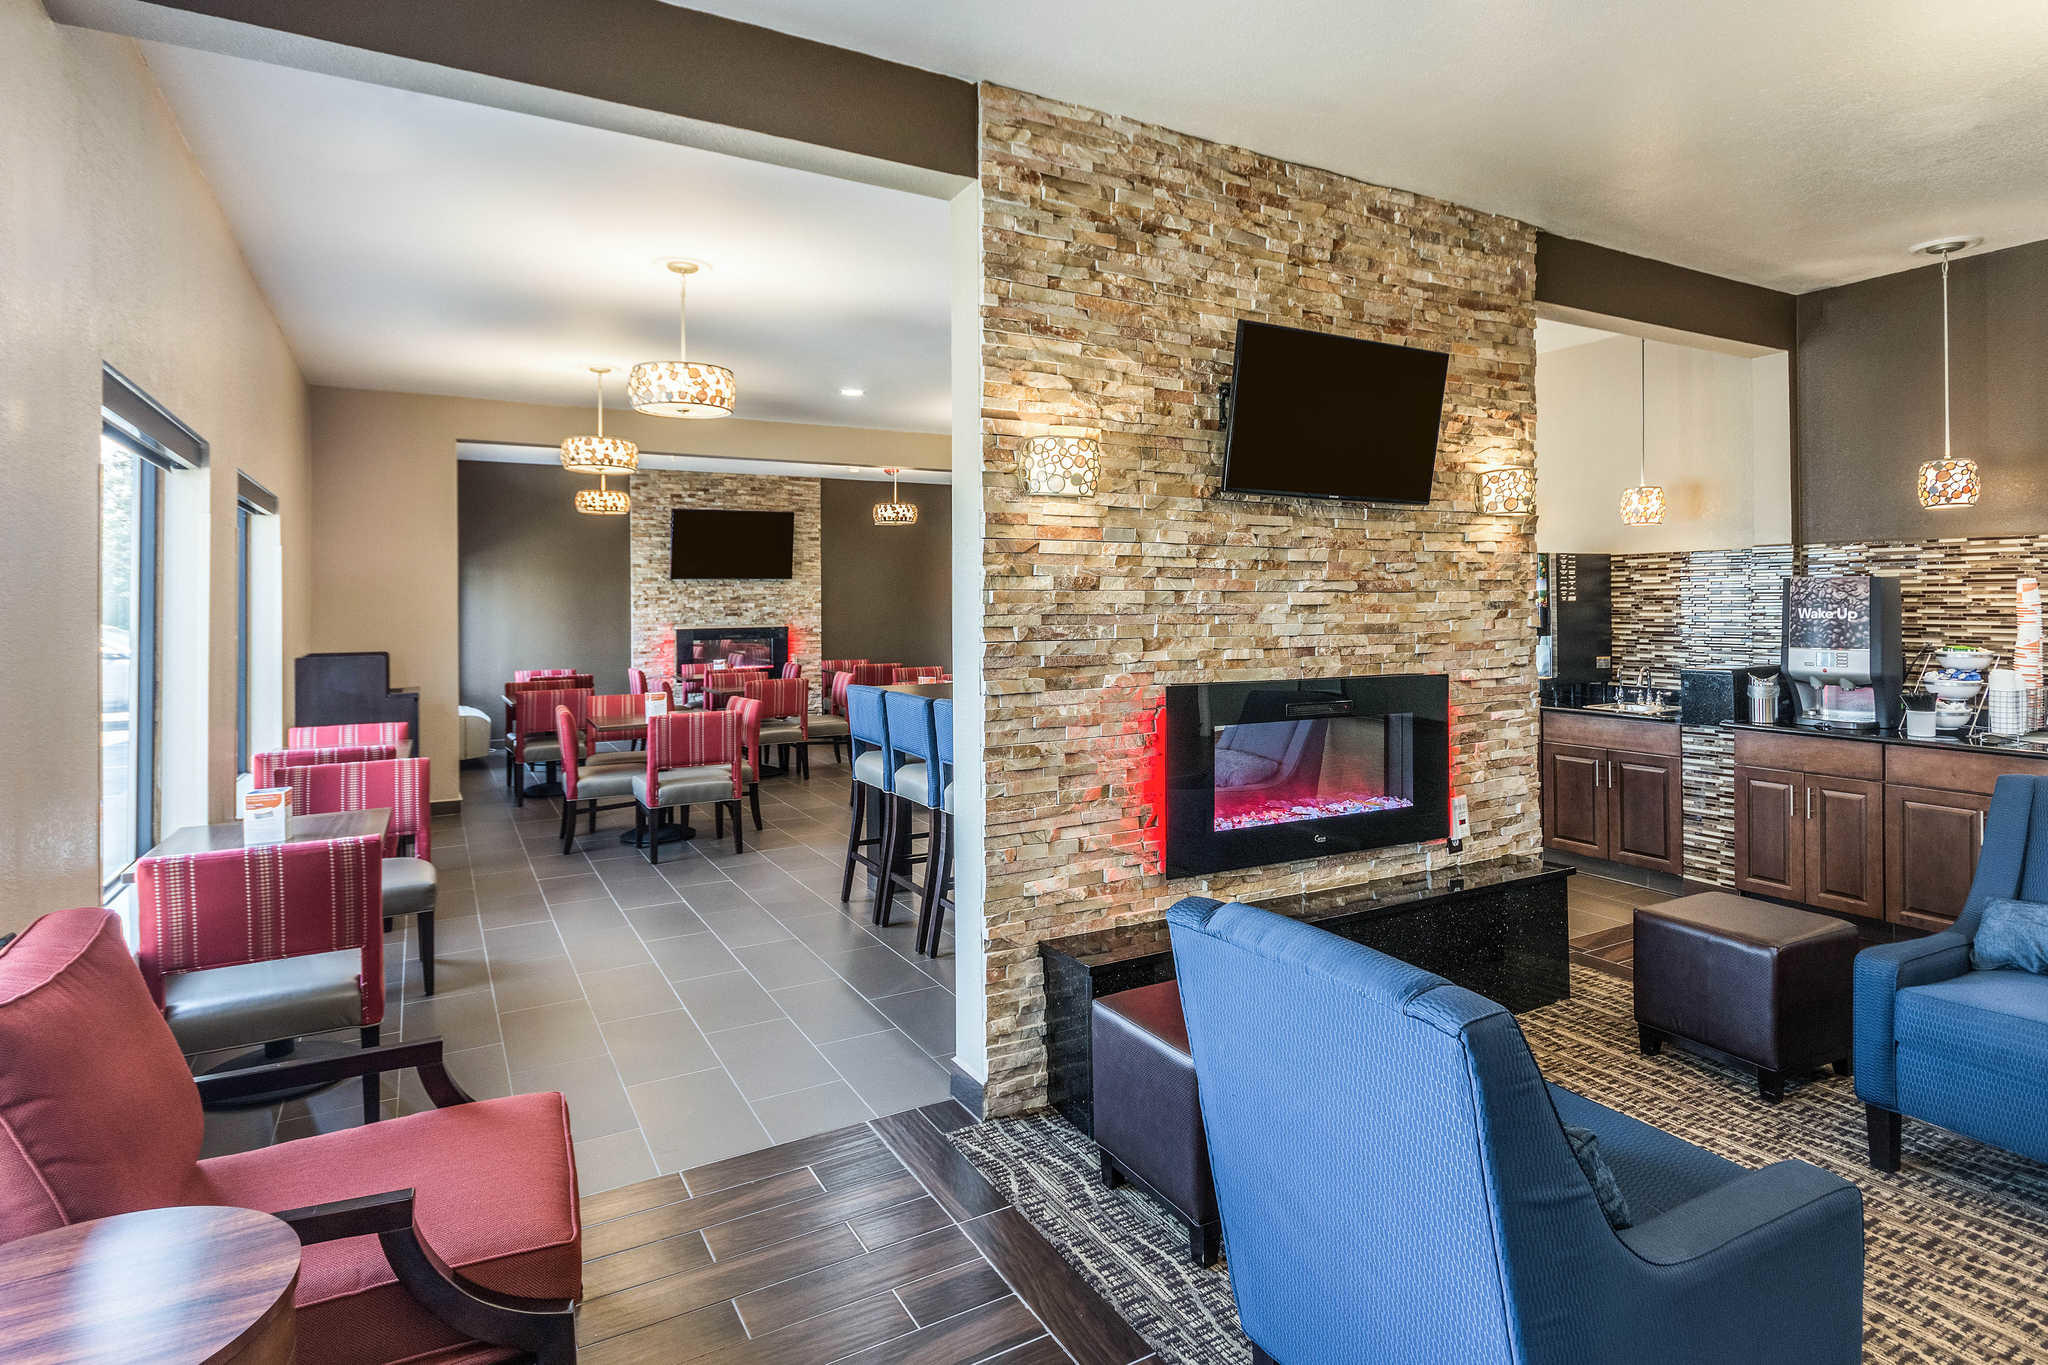 Comfort Inn & Suites North Aurora - Naperville image 7